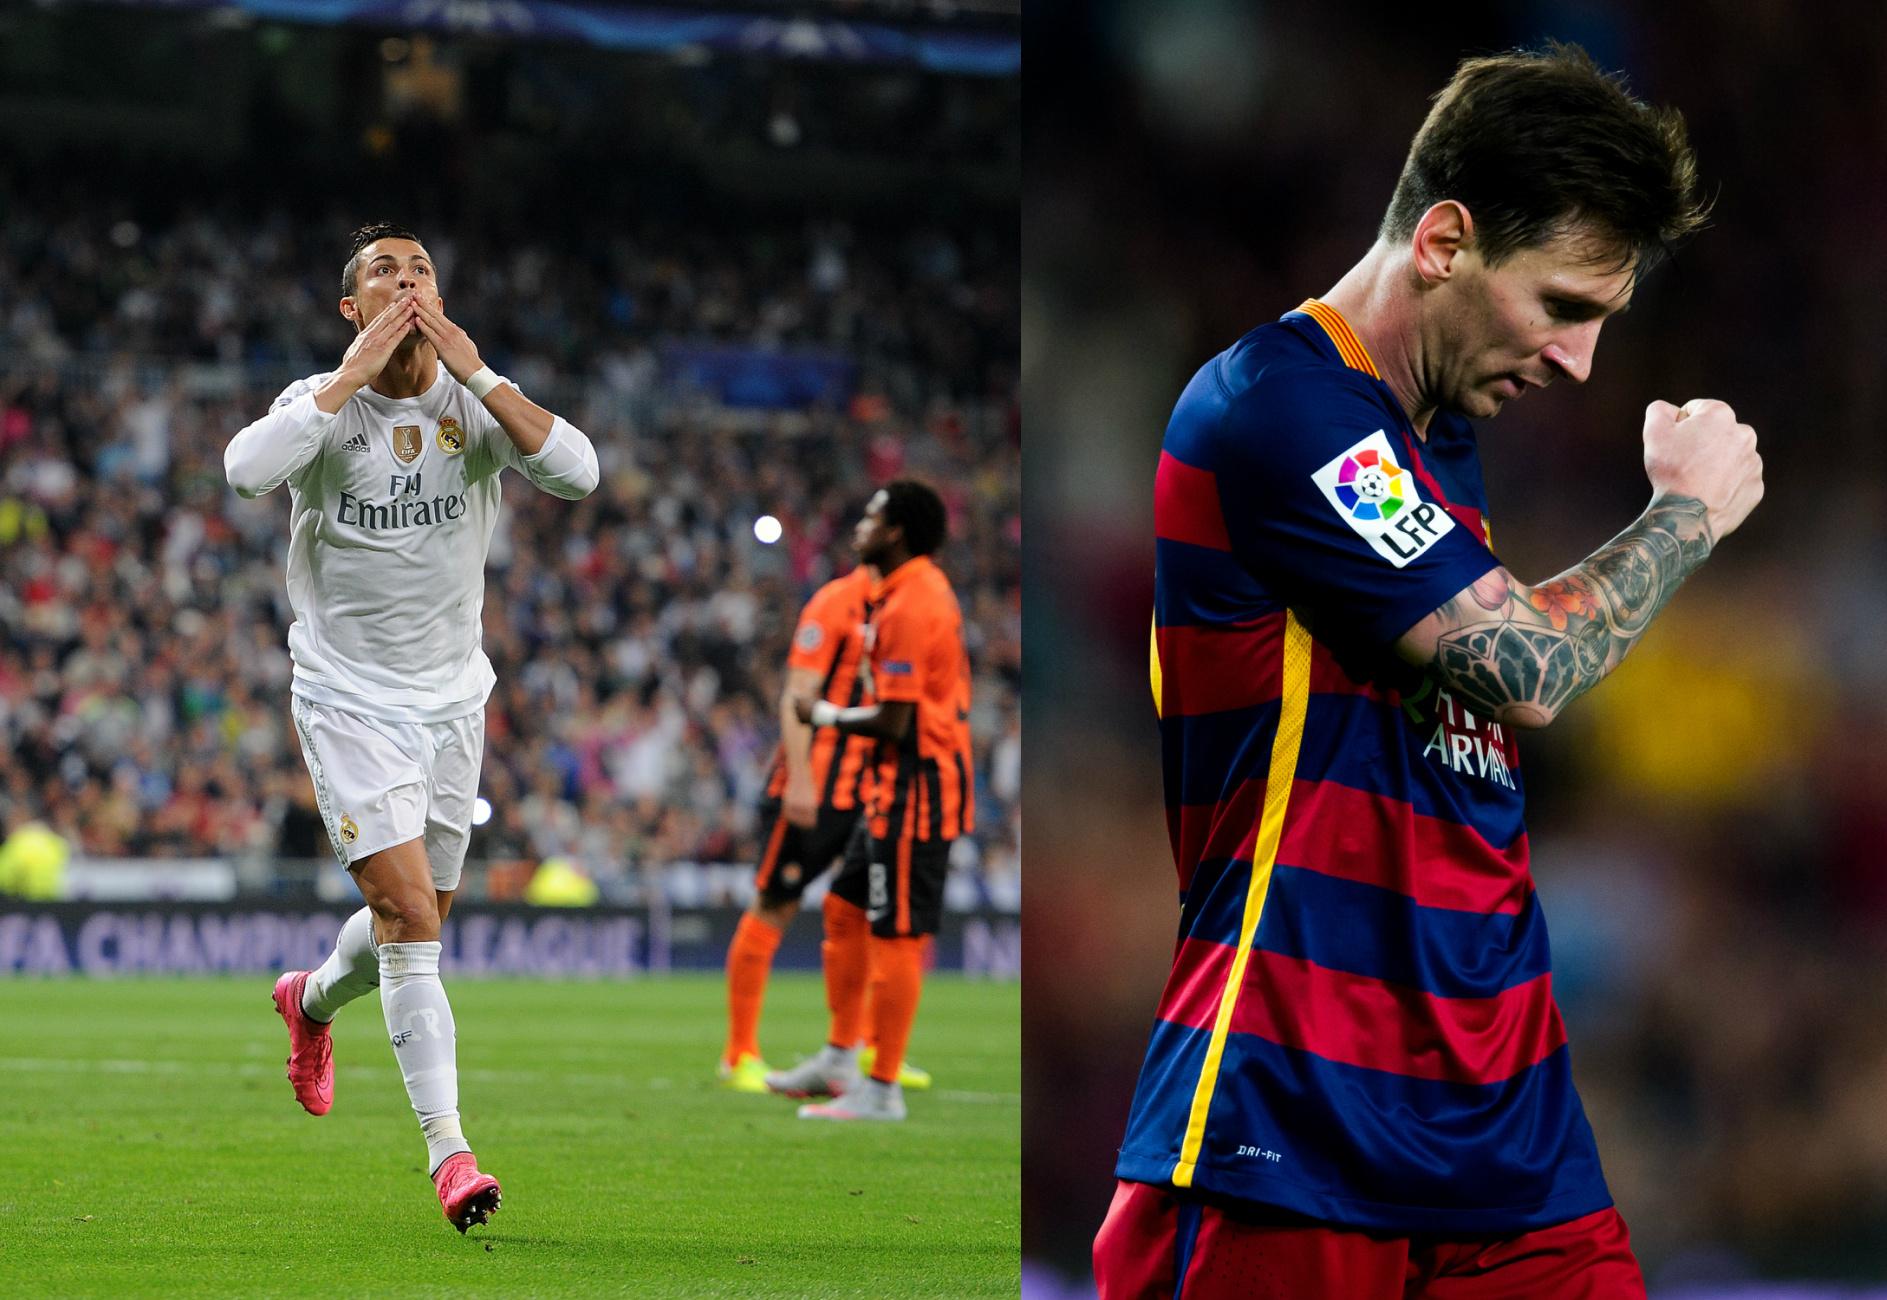 Messi Vs. Ronaldo 2015-16 - Week 4: 3 Goals For Ronaldo, 2